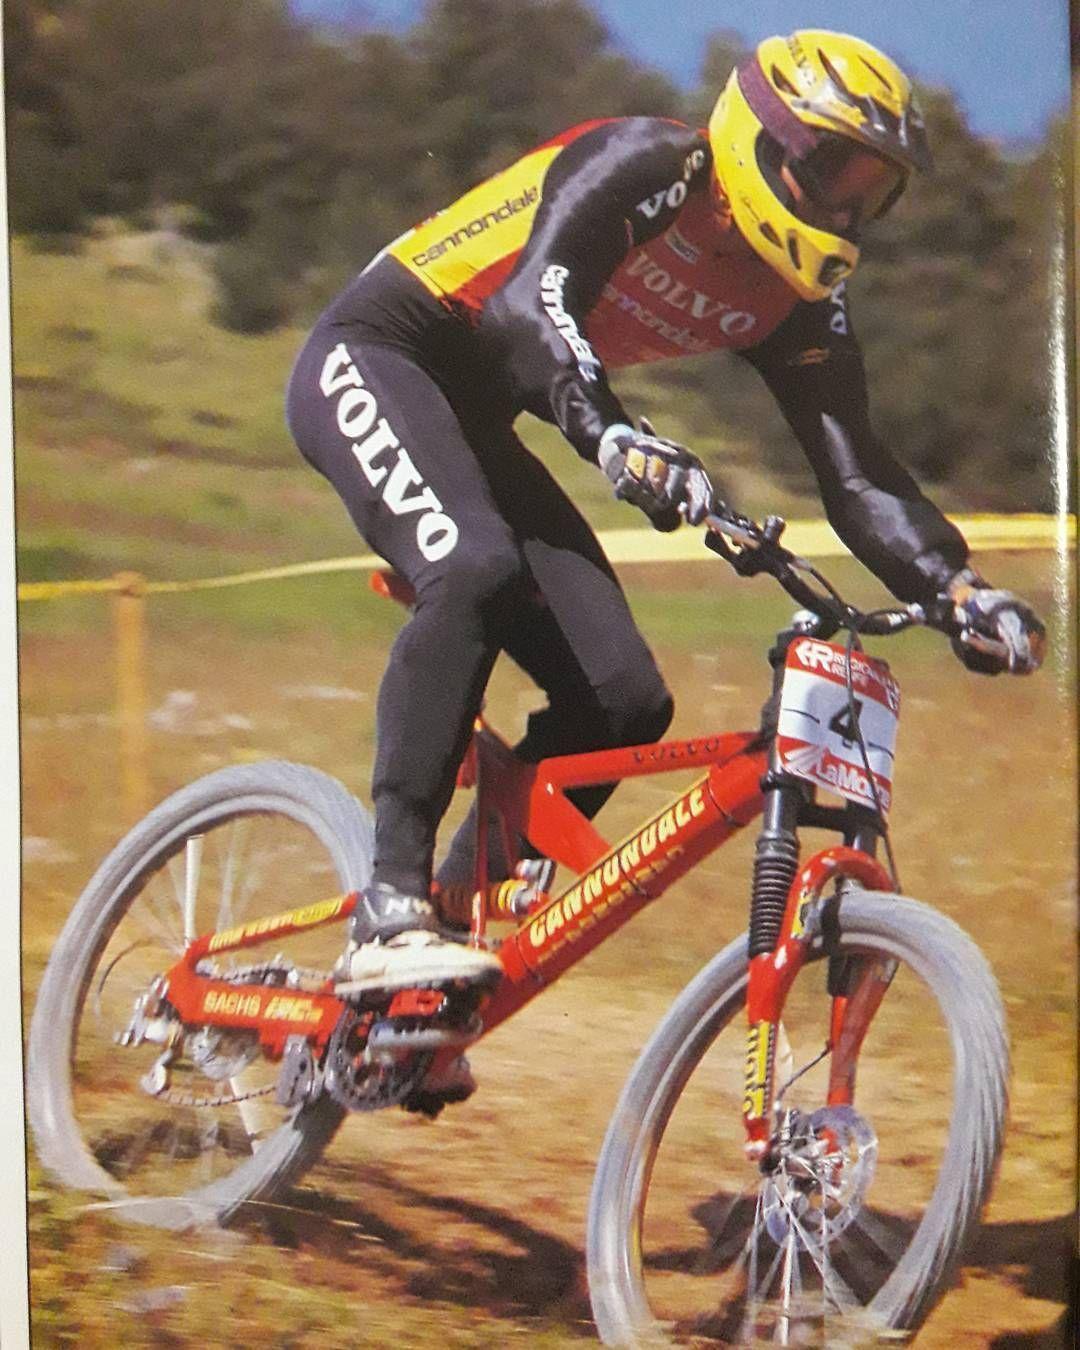 11efe1095e2 Oscar Saiz showing how to do it properly #retromtb #retrobike #downhill  #downhillmtb